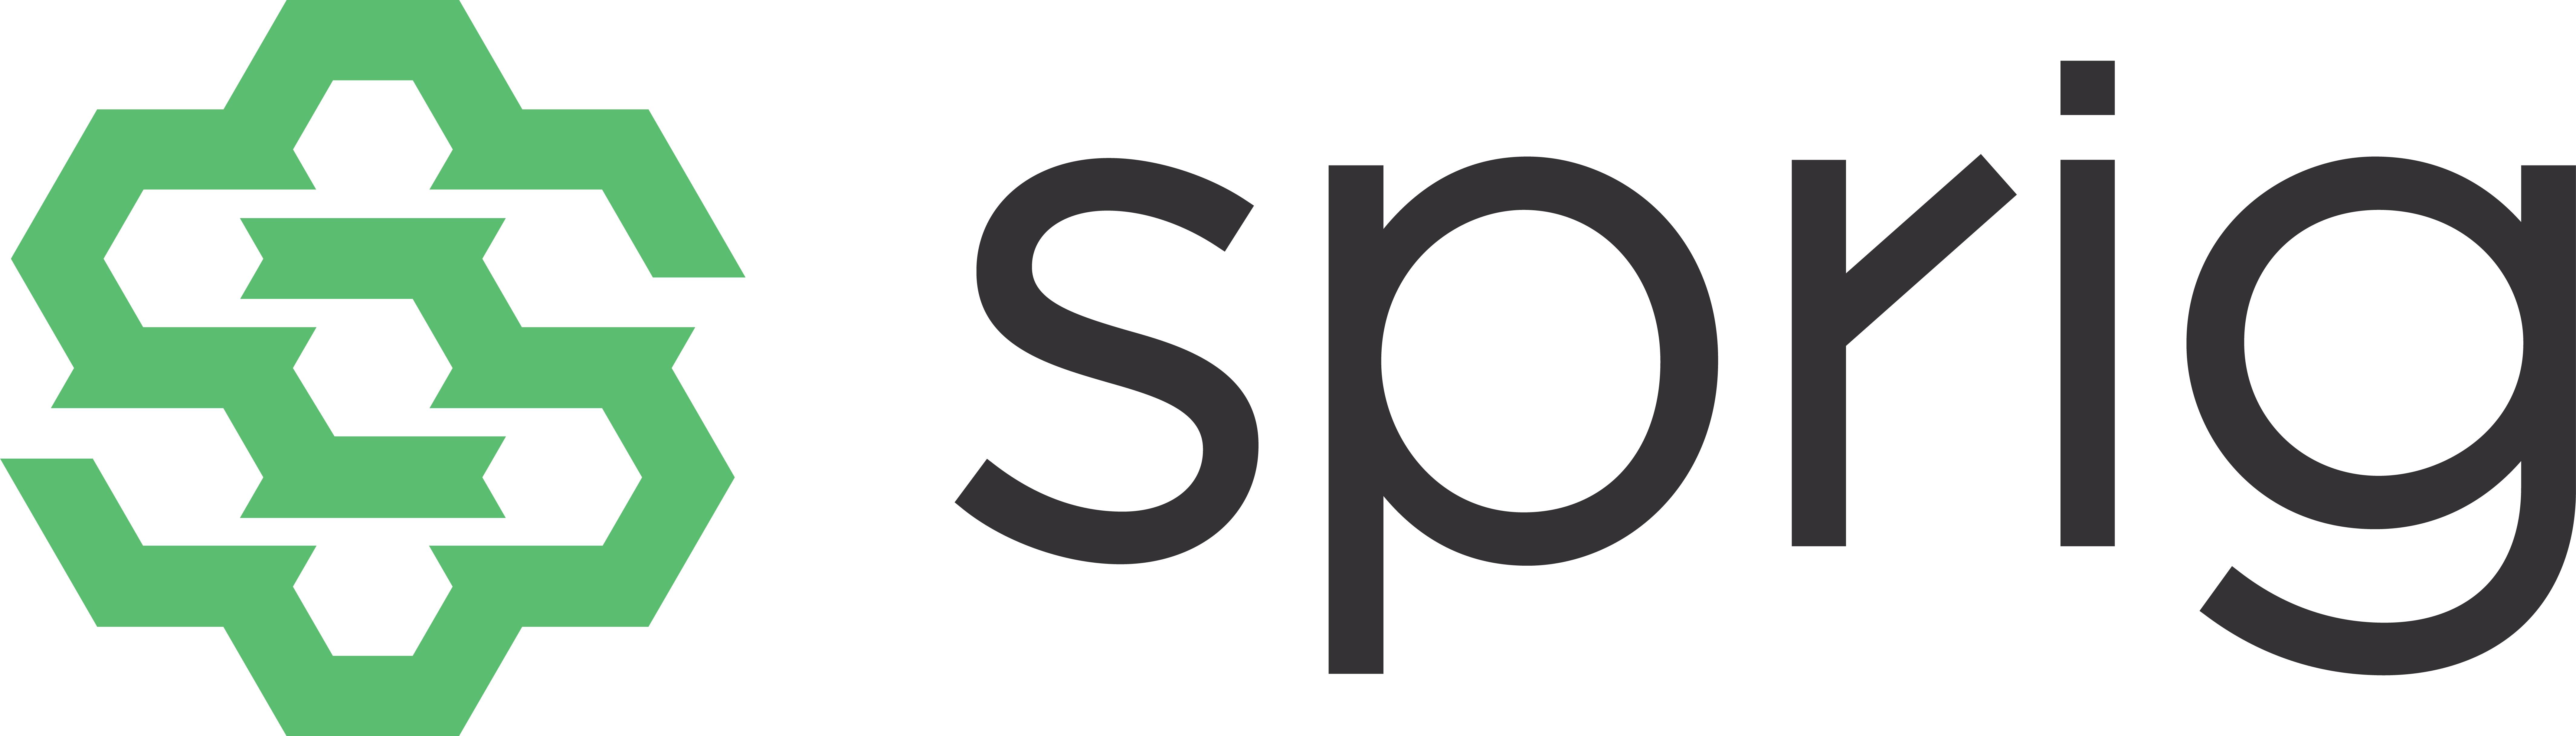 zr management logo company logo ideas t